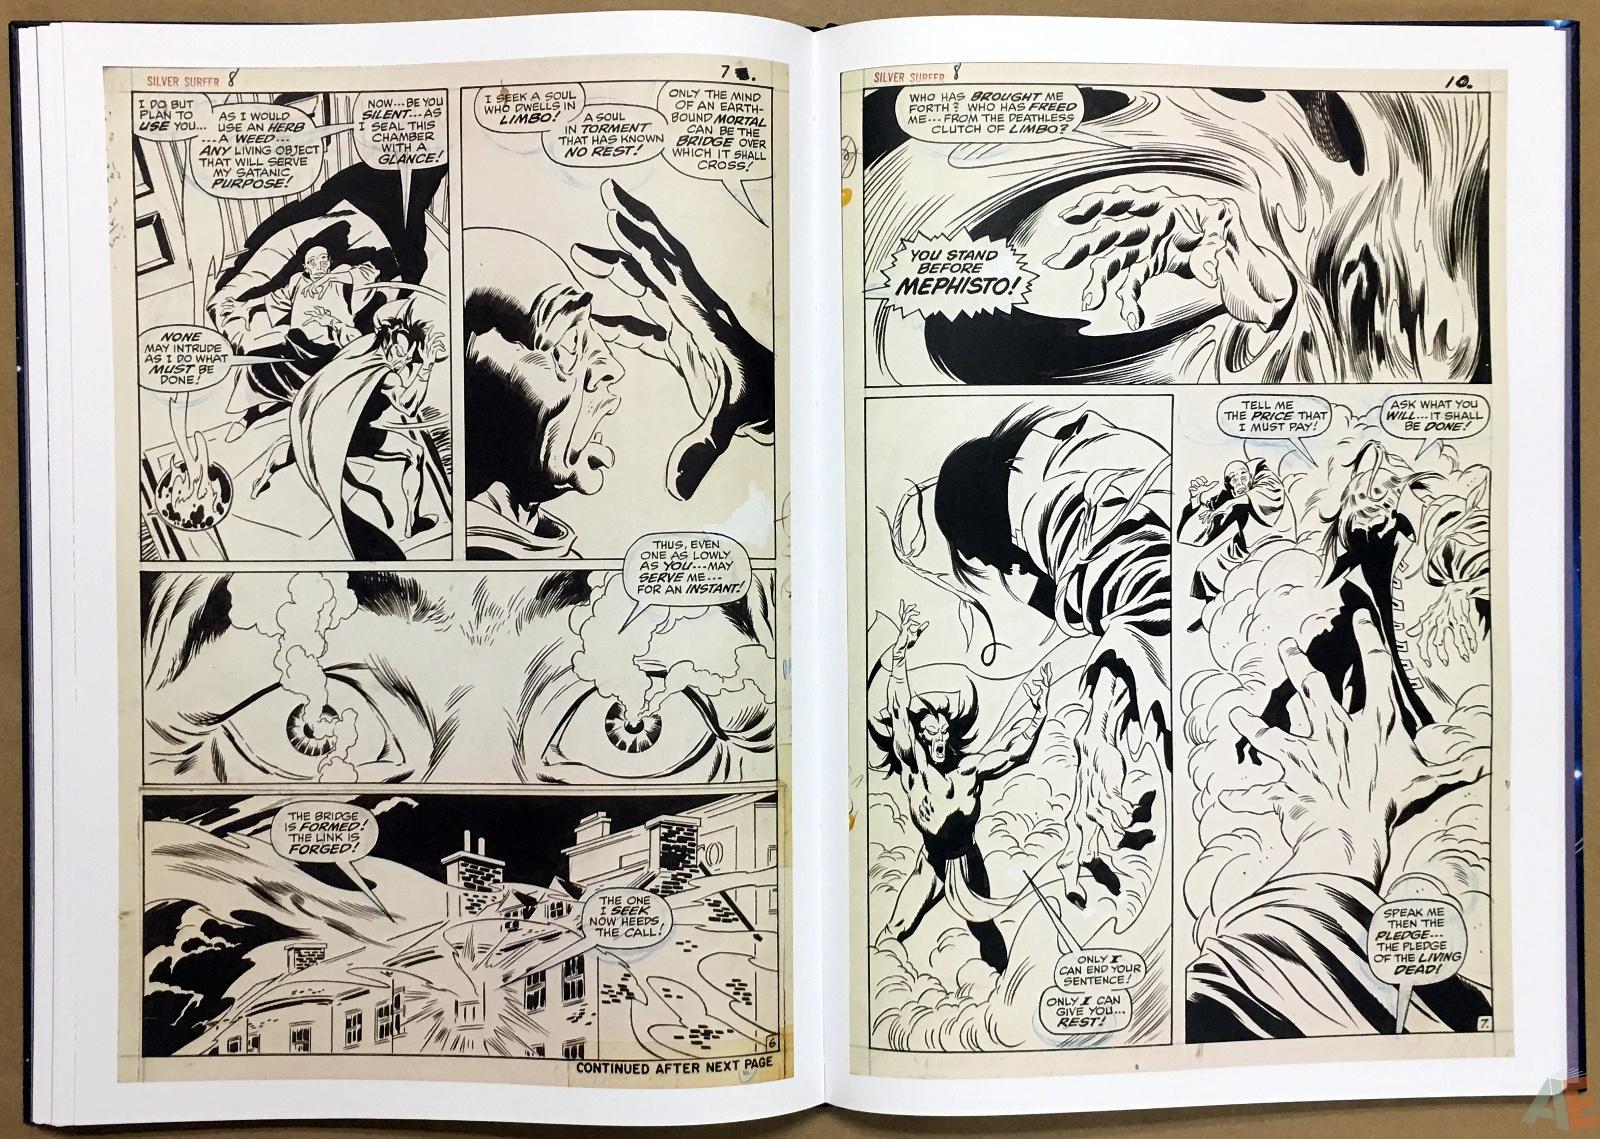 John Buscema's Silver Surfer Artist's Edition 26